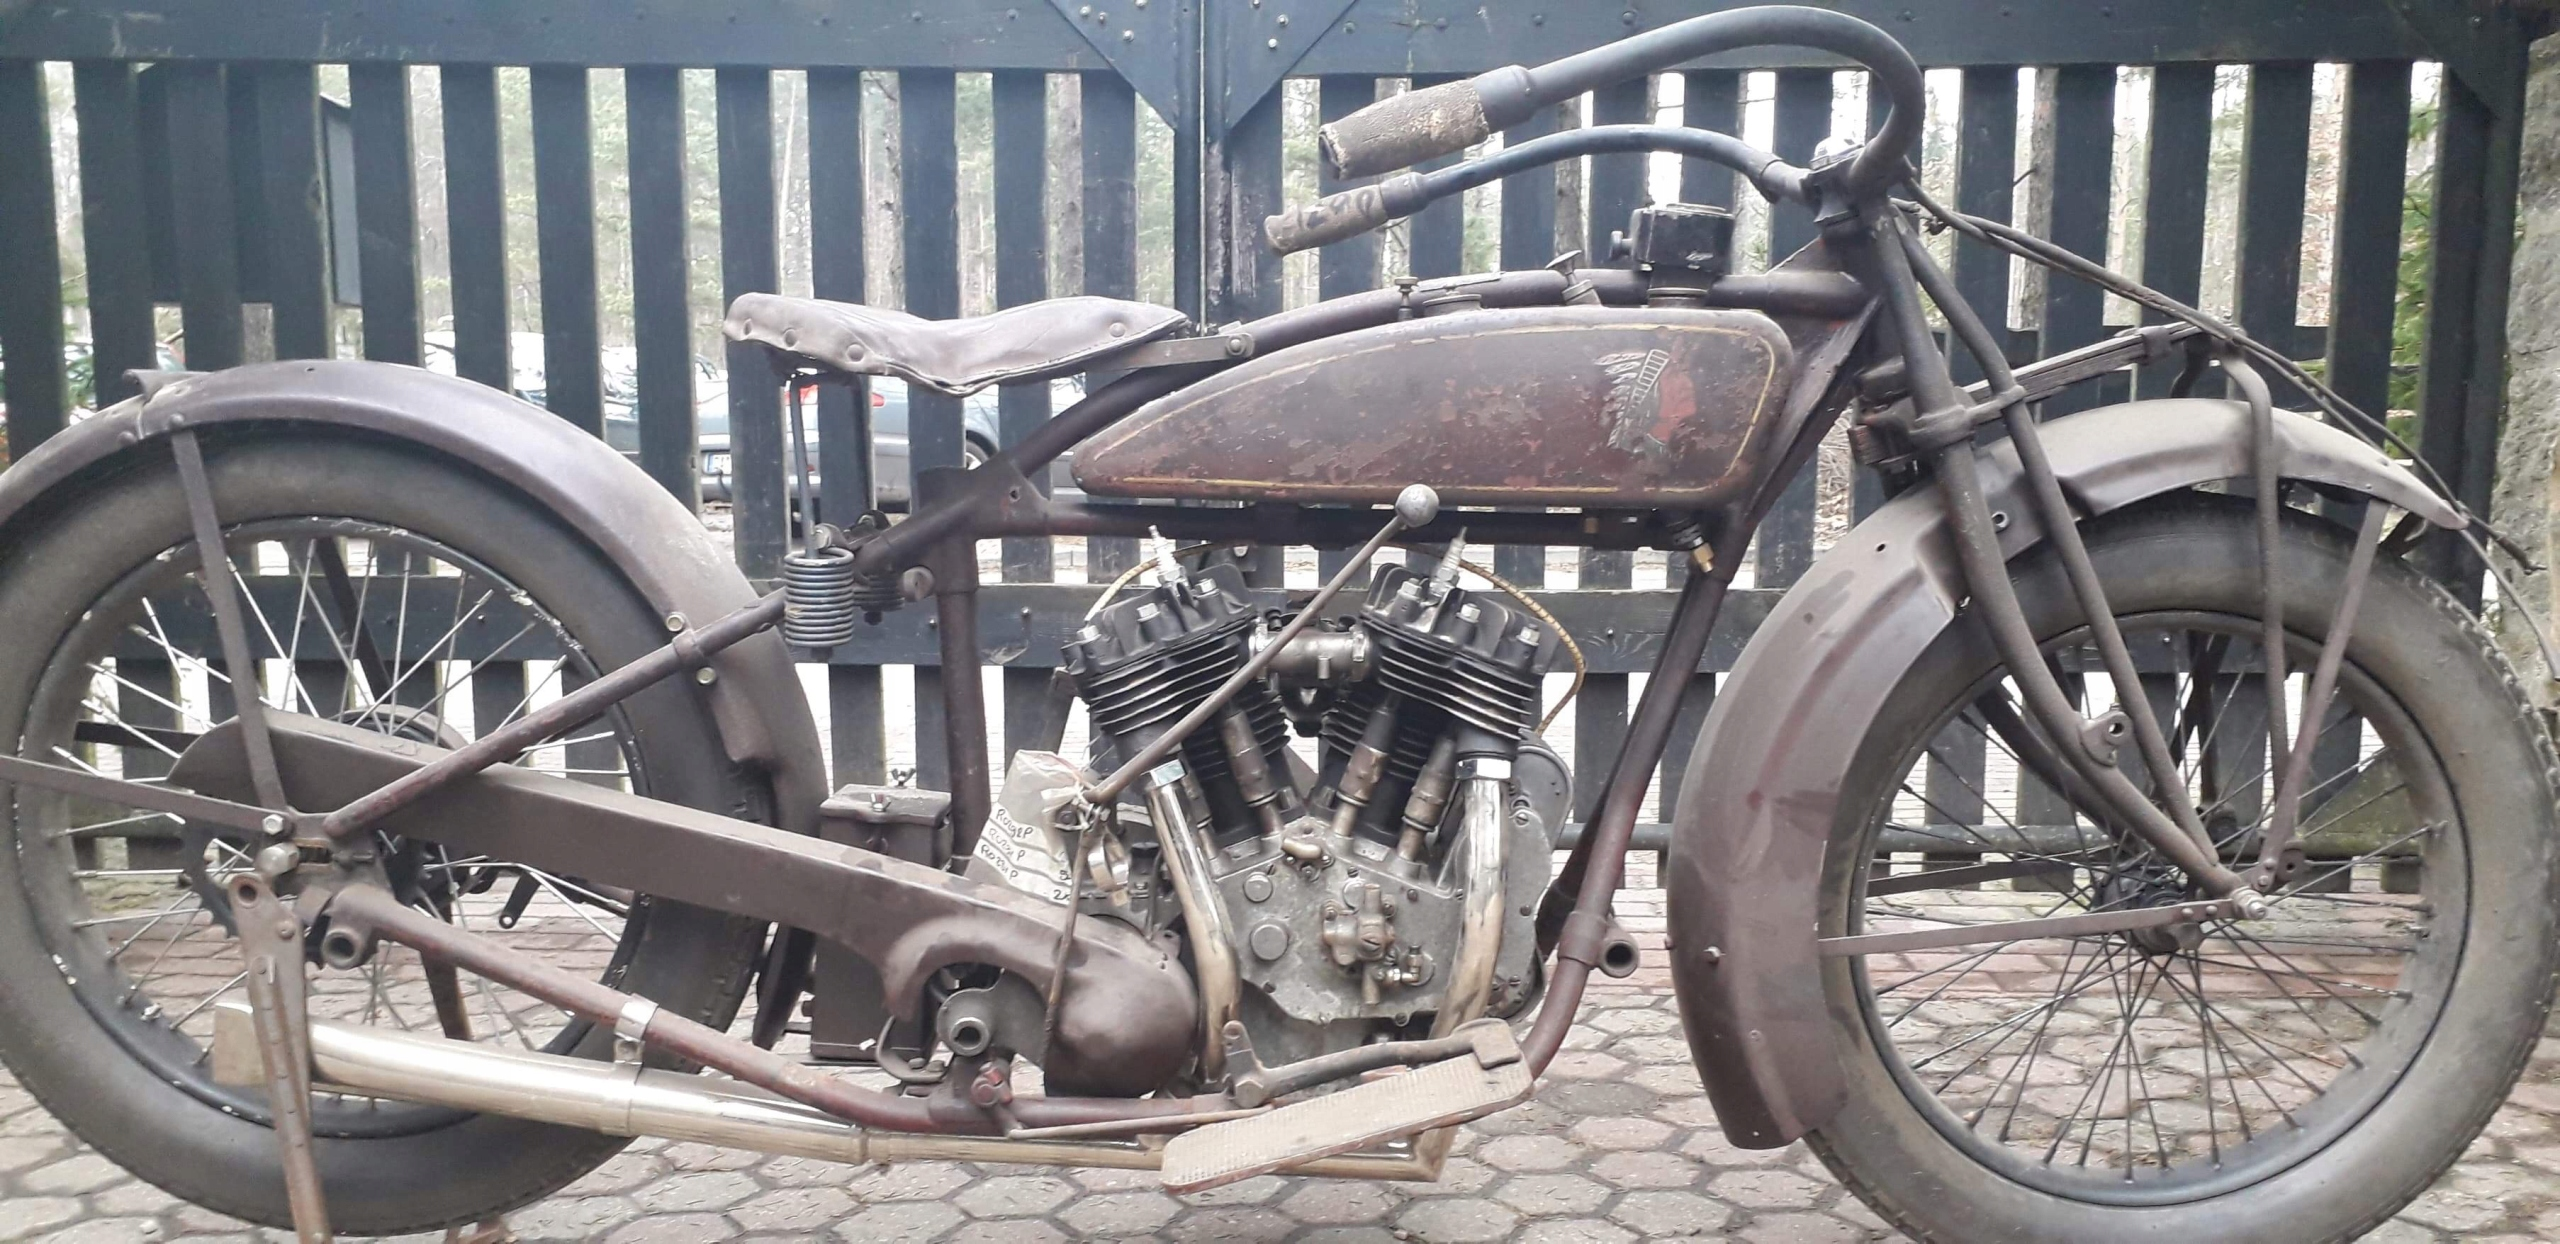 Indian Chief 1927r. BMW, Sokół, Harley, Zundapp